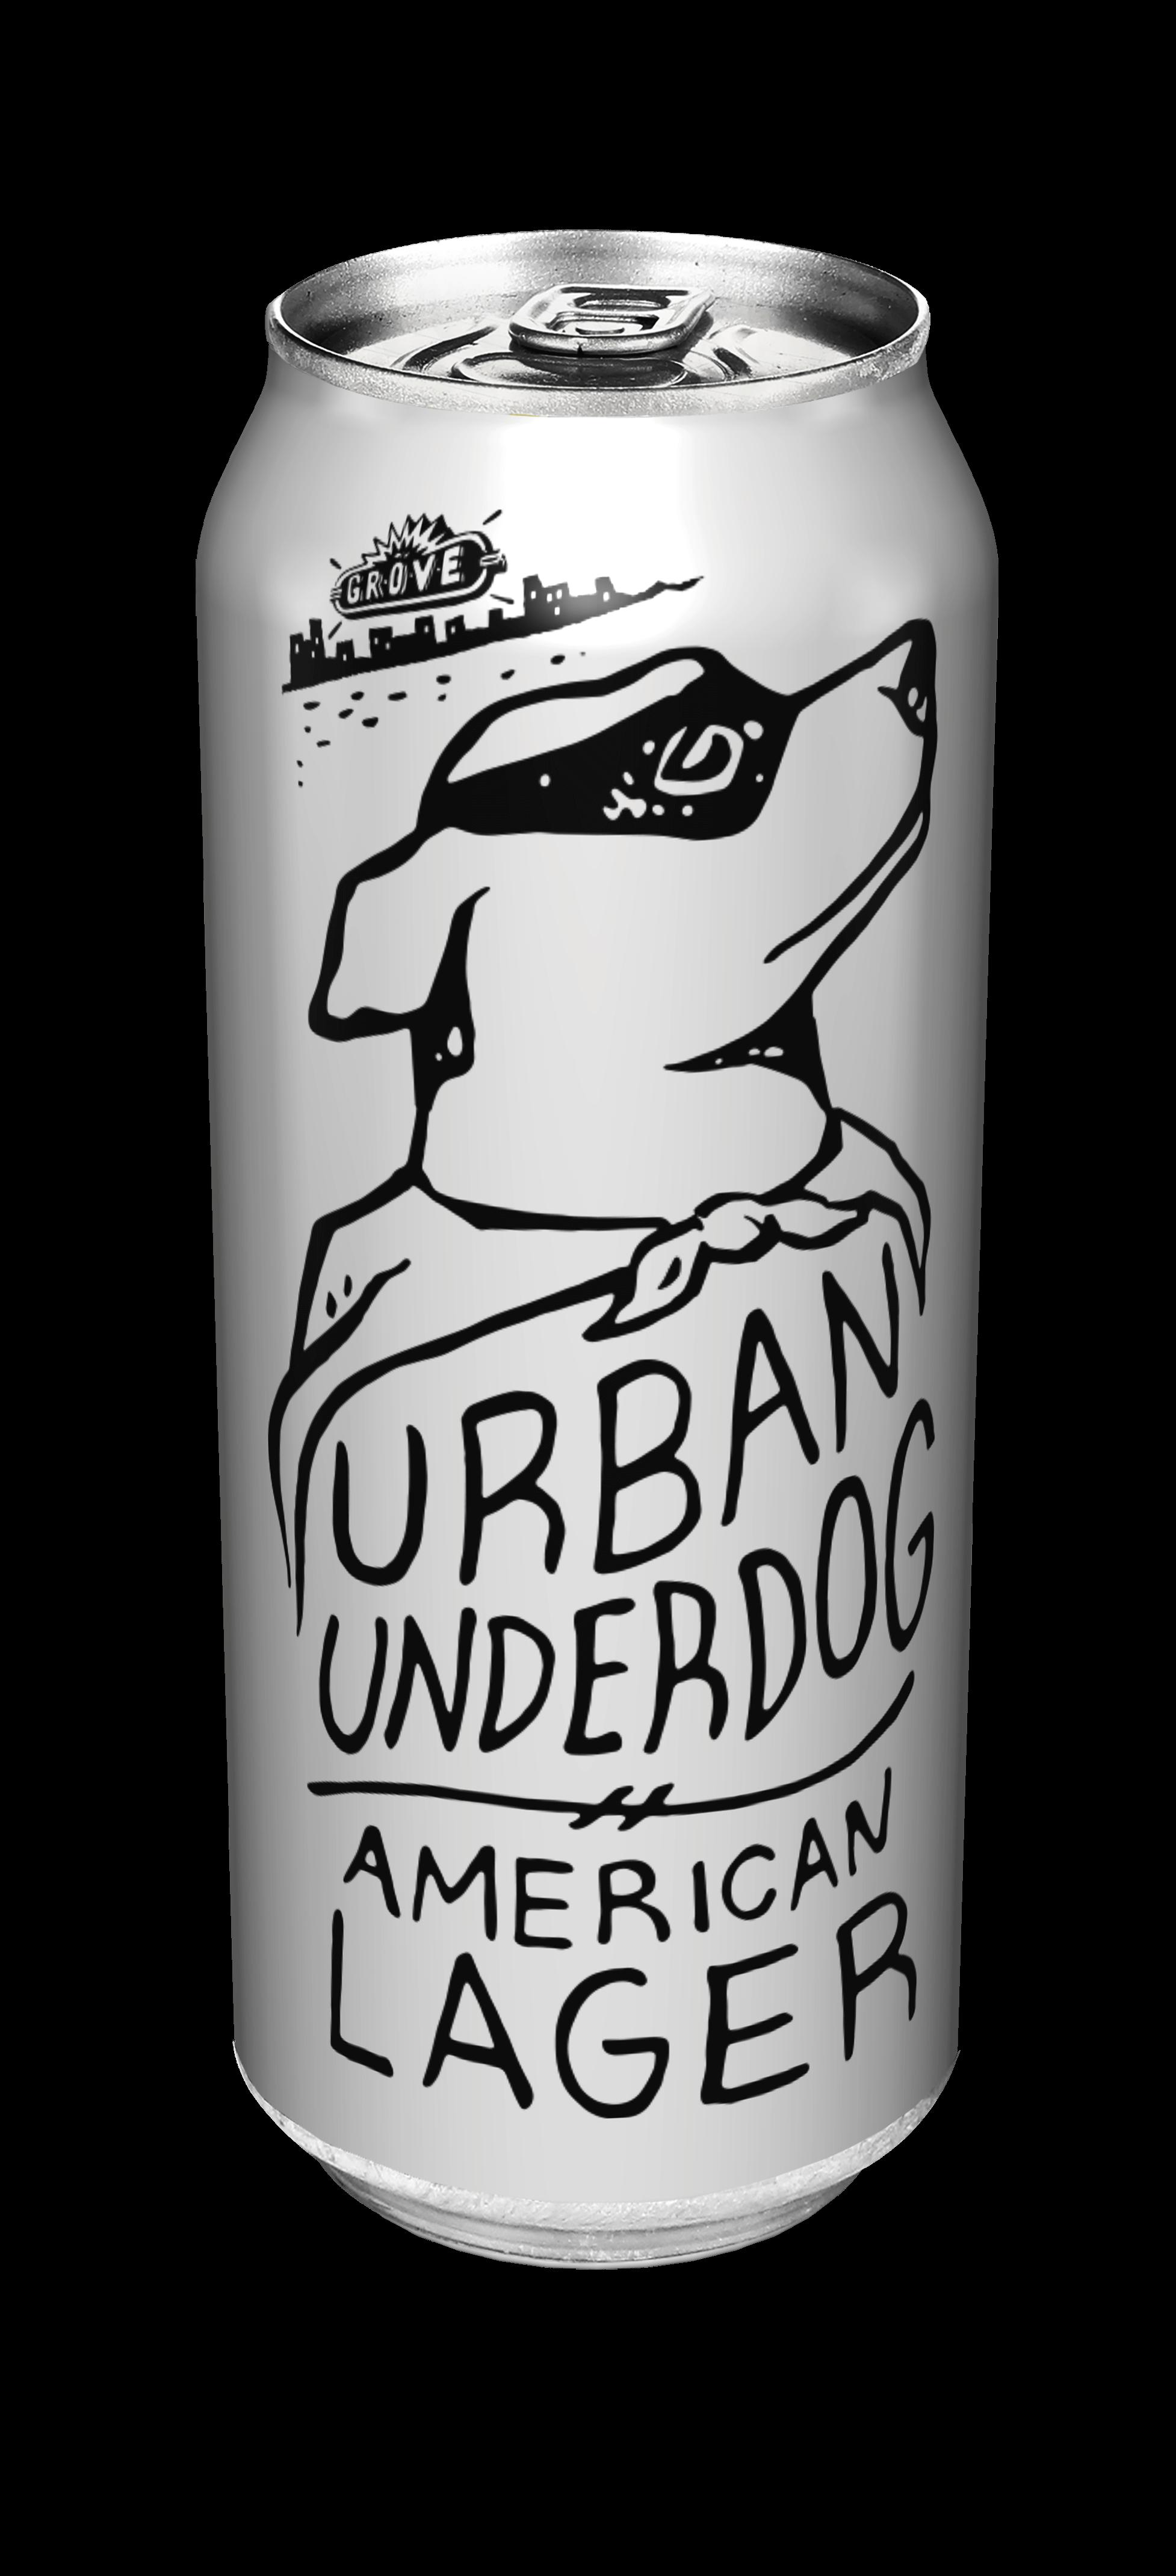 Urban Underdog American Lager